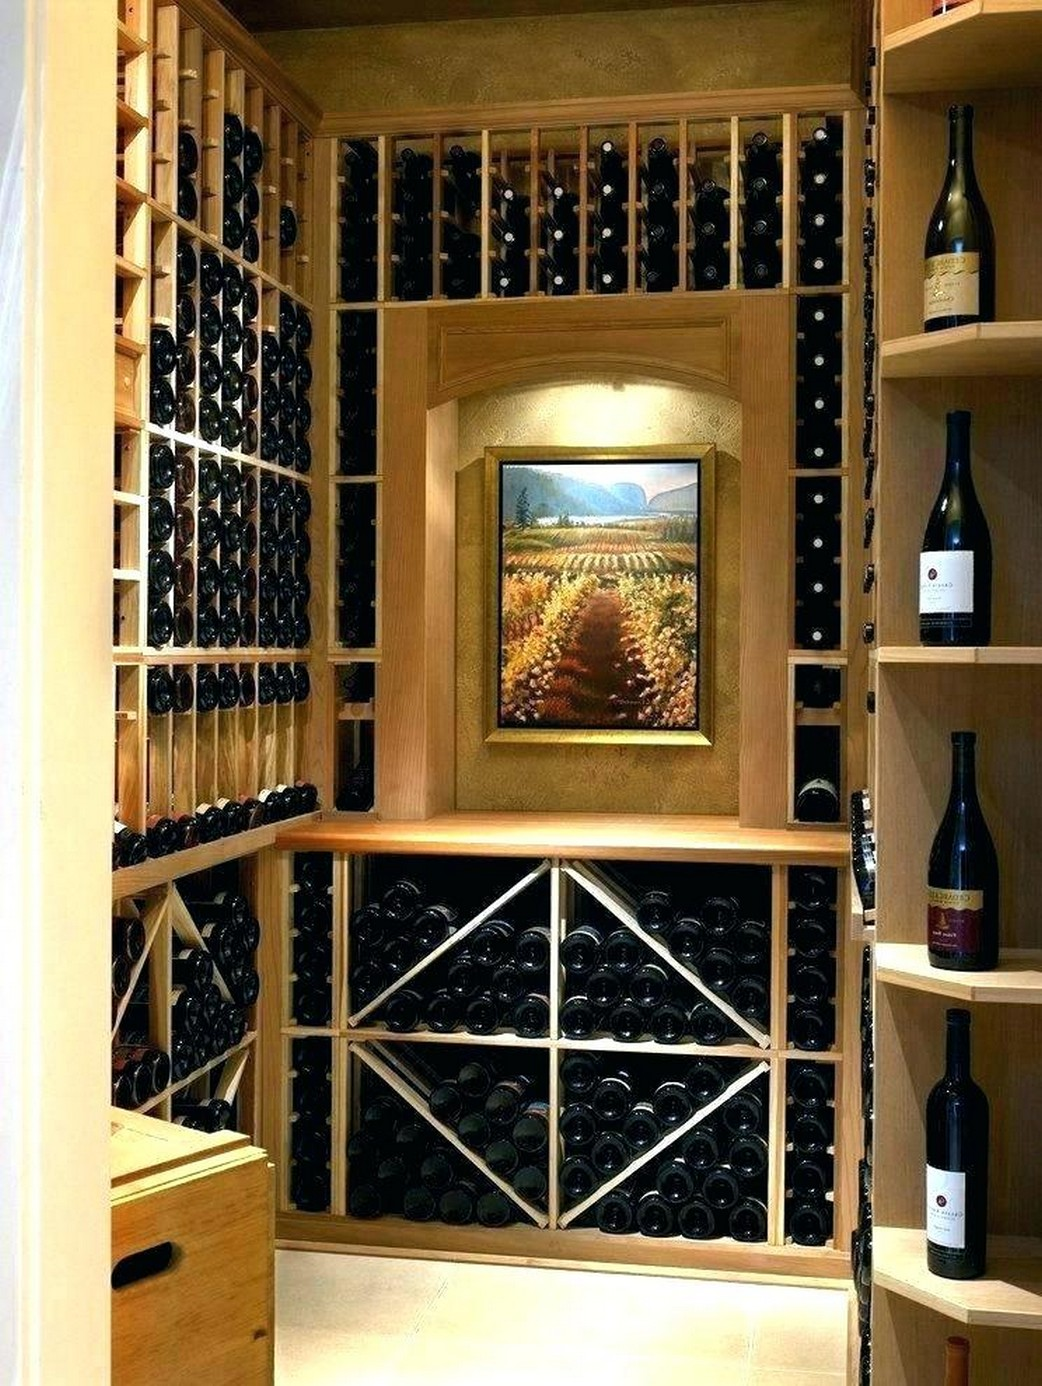 21 Magnificent Cellar Architecture